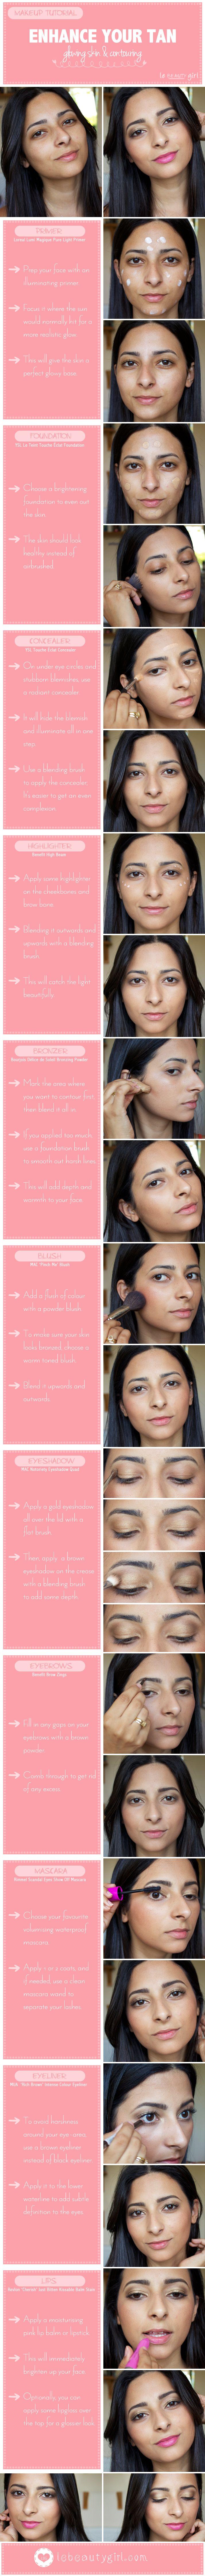 Enhance Your Tan: Glowing Skin & Contouring (Makeup Tutorial)